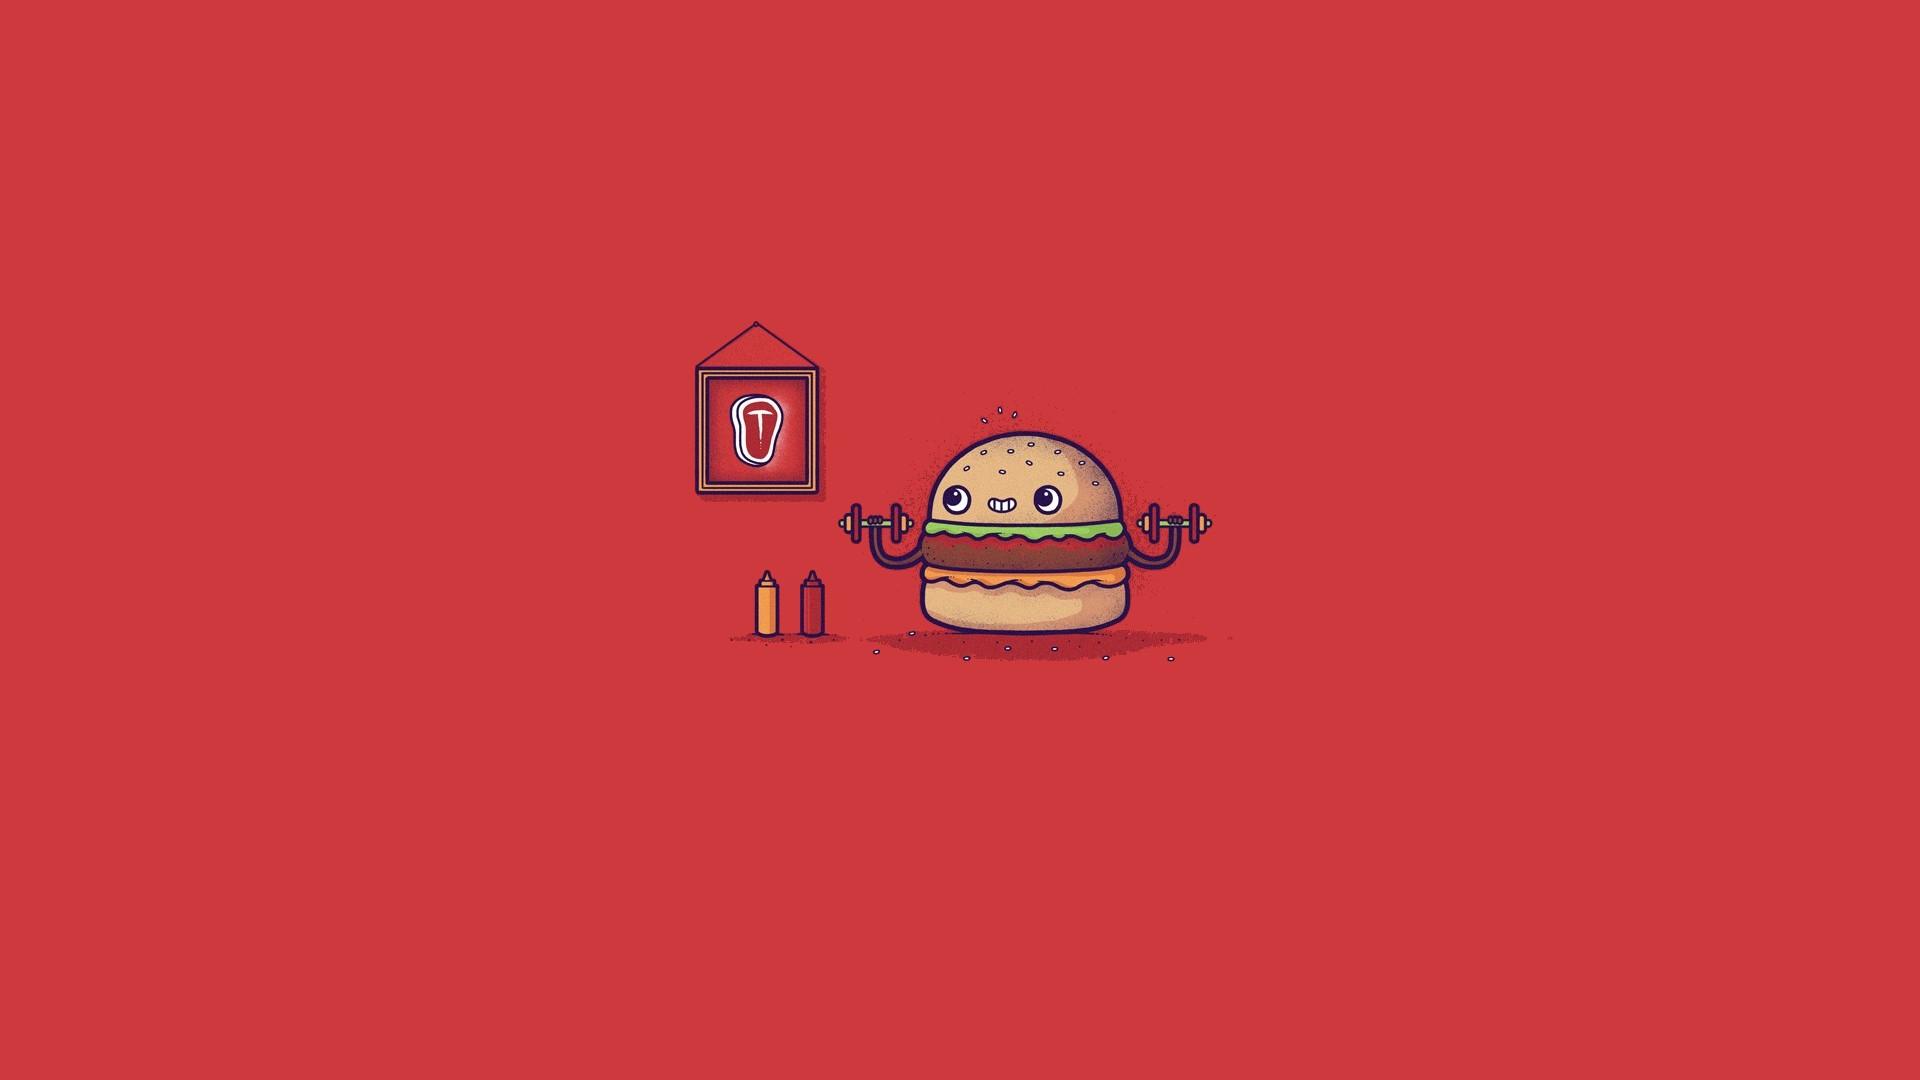 Fondos De Pantalla Ilustración Minimalismo Texto Logo Dibujos